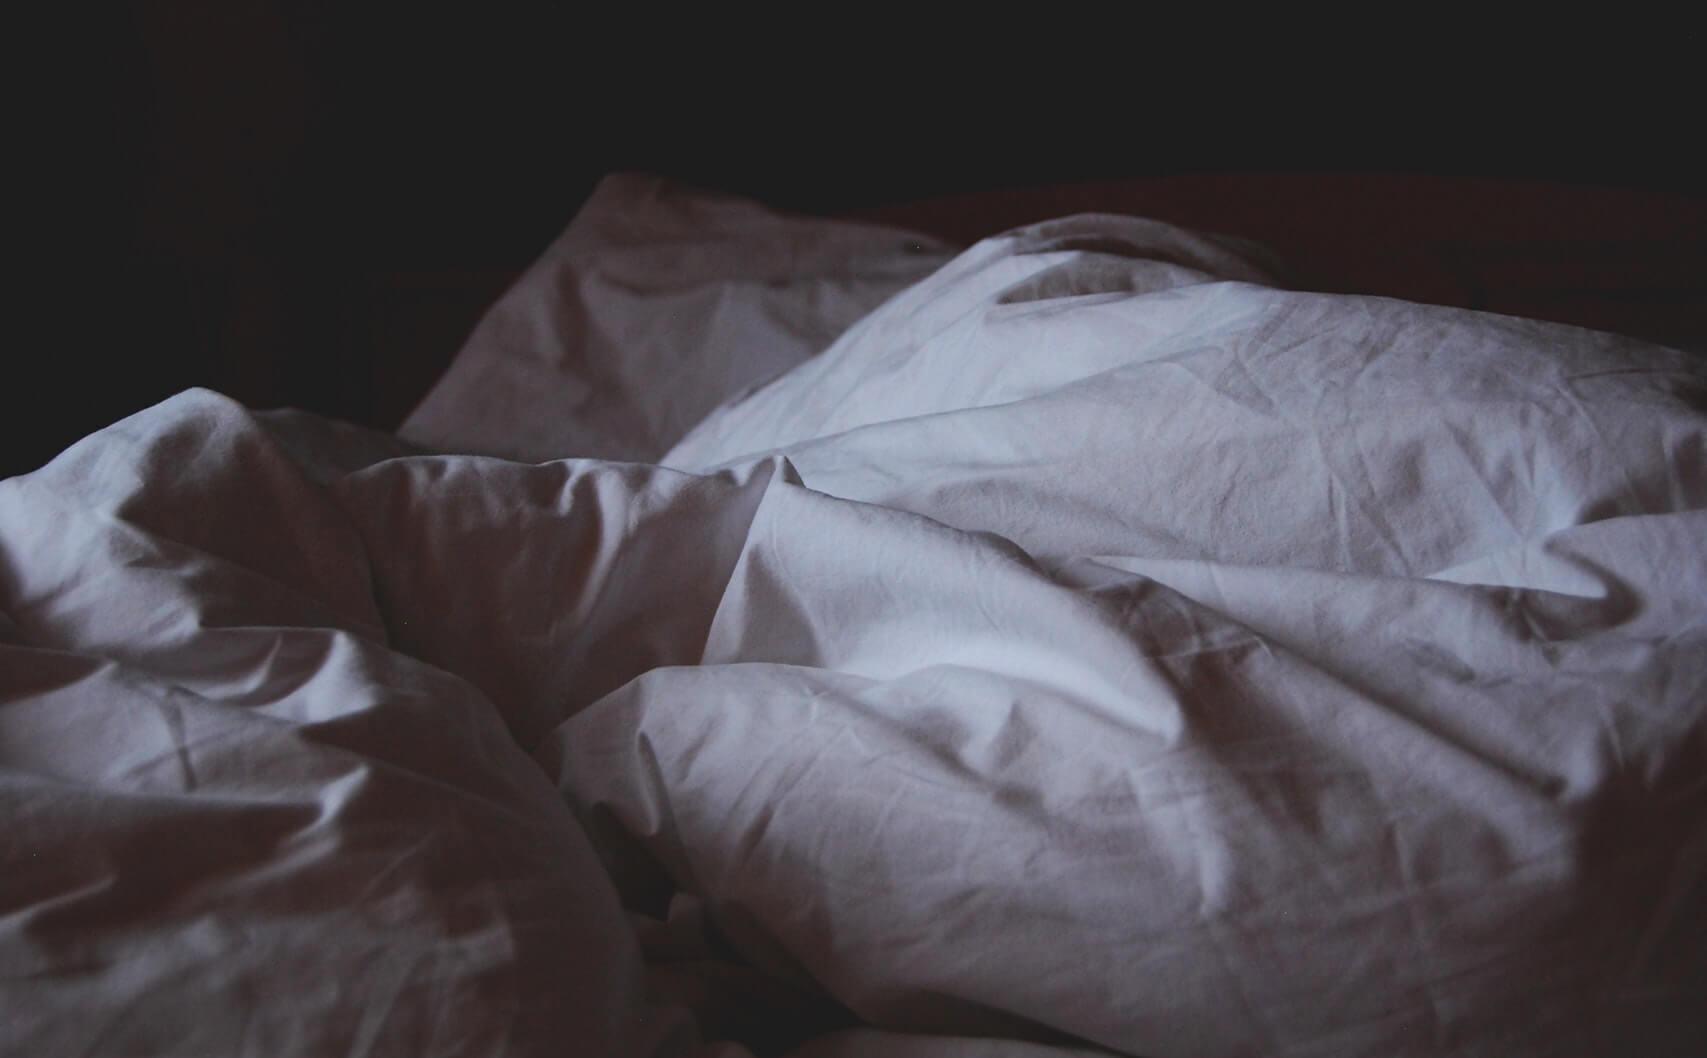 Sing me to sleep: 11 мест, где можно выспаться